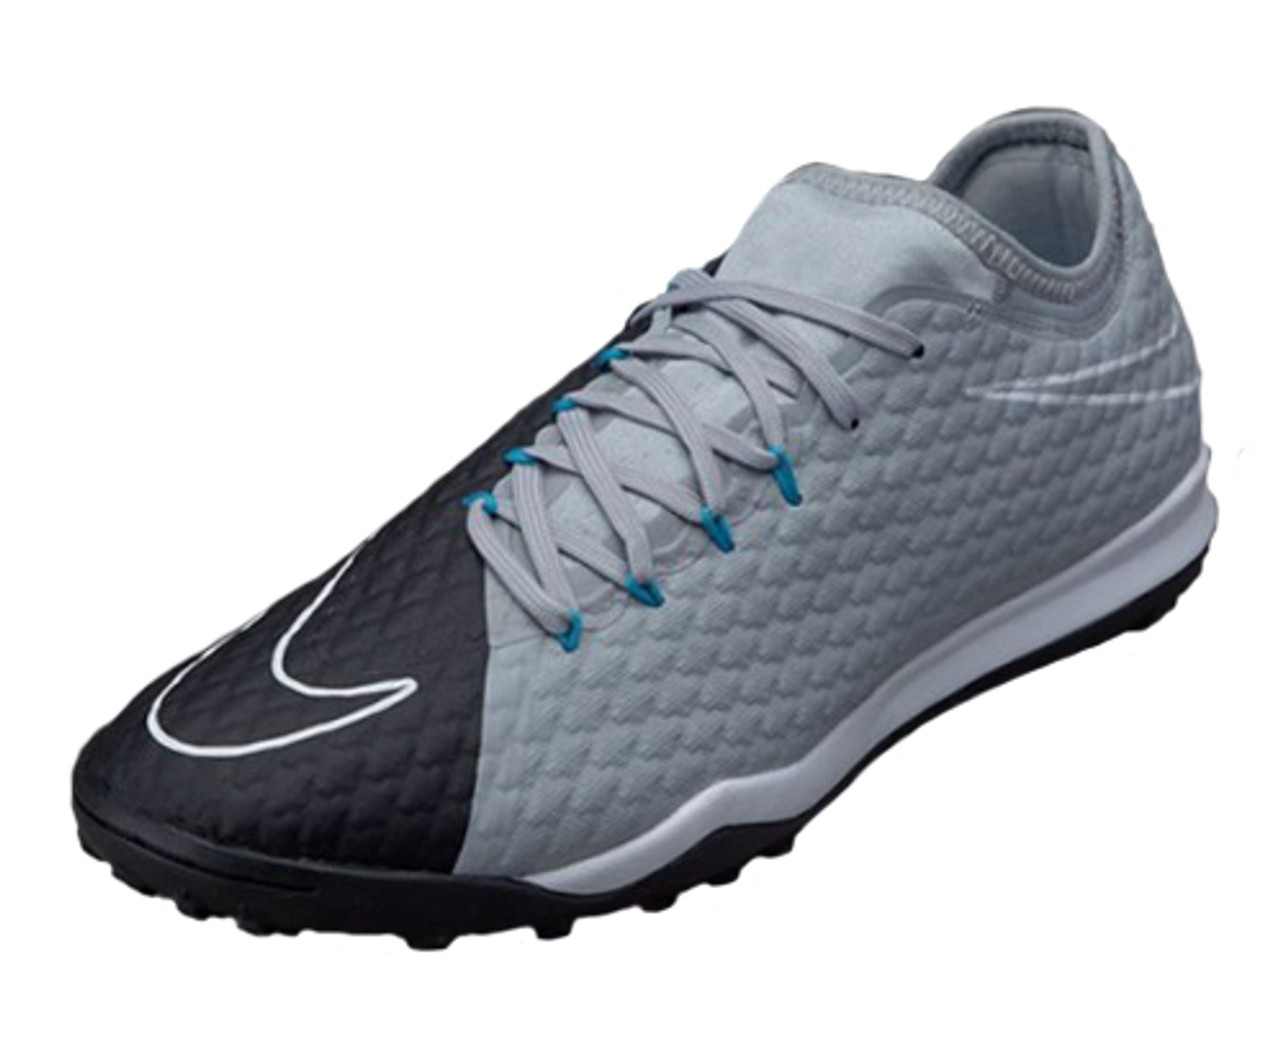 59aafea48 Nike HypervenomX Finale II TF - Wolf Grey Black Chlorine Blue (42617) - ohp  soccer